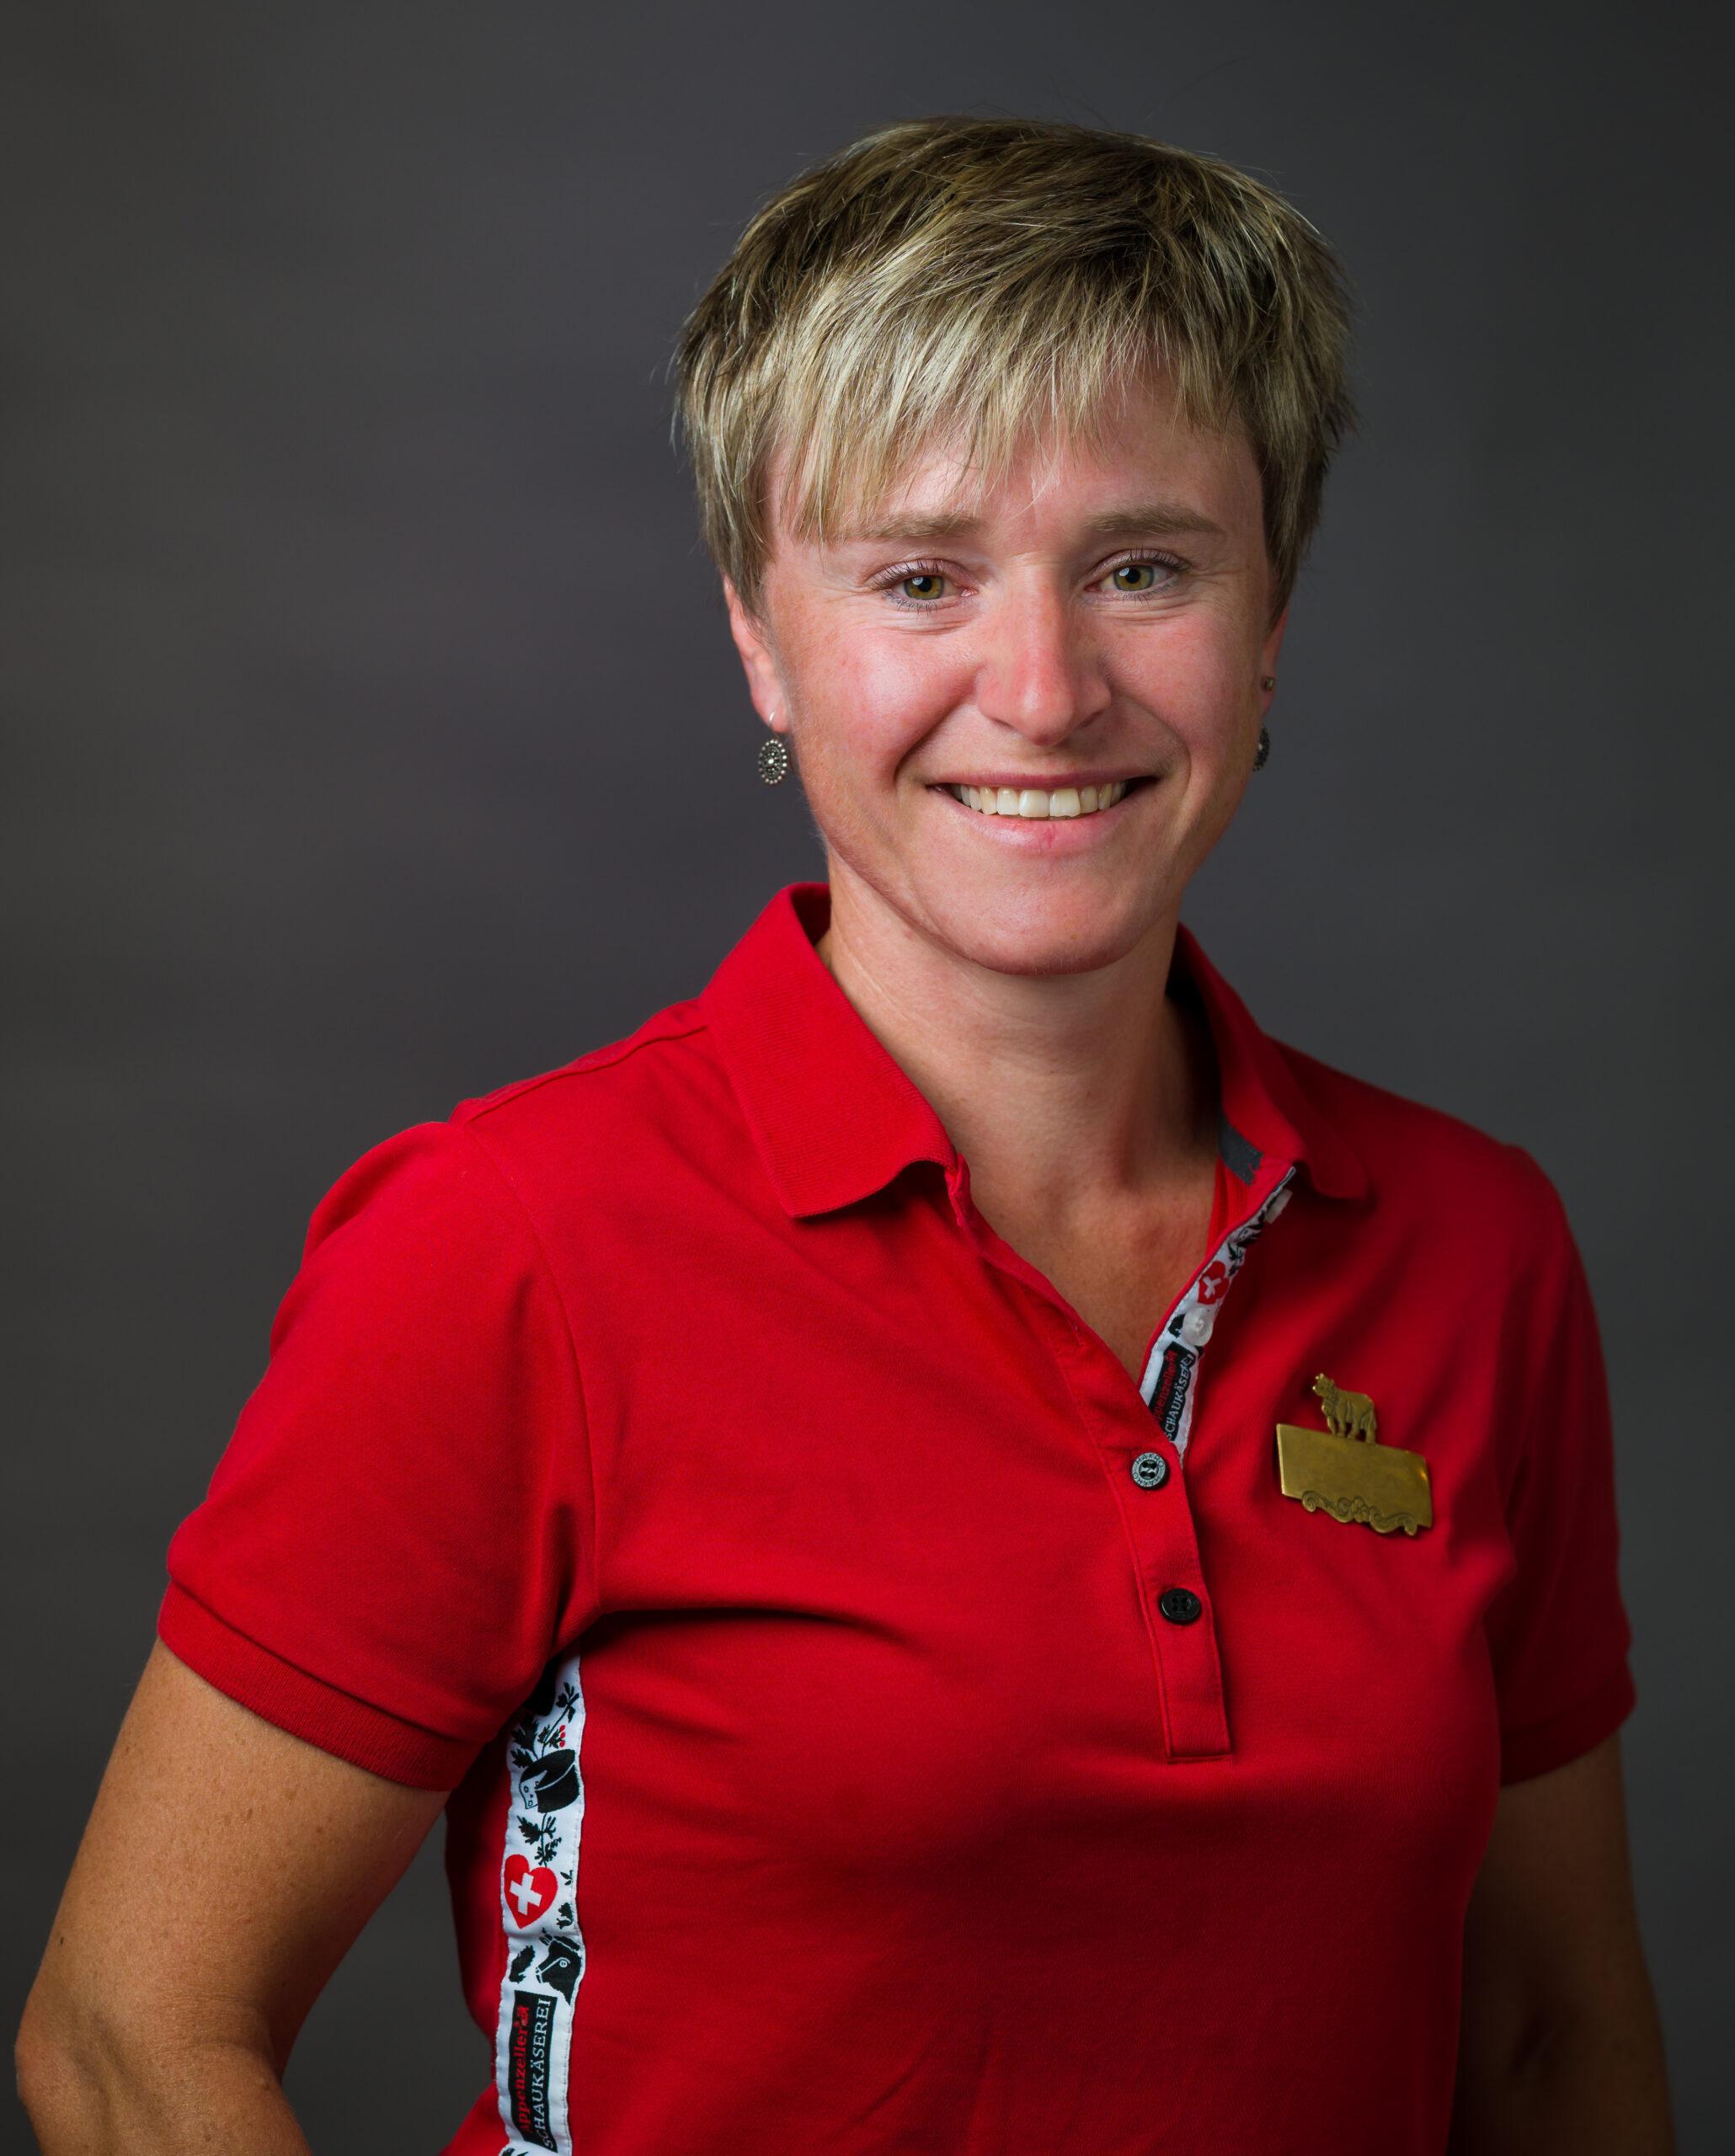 Silvia Rusch